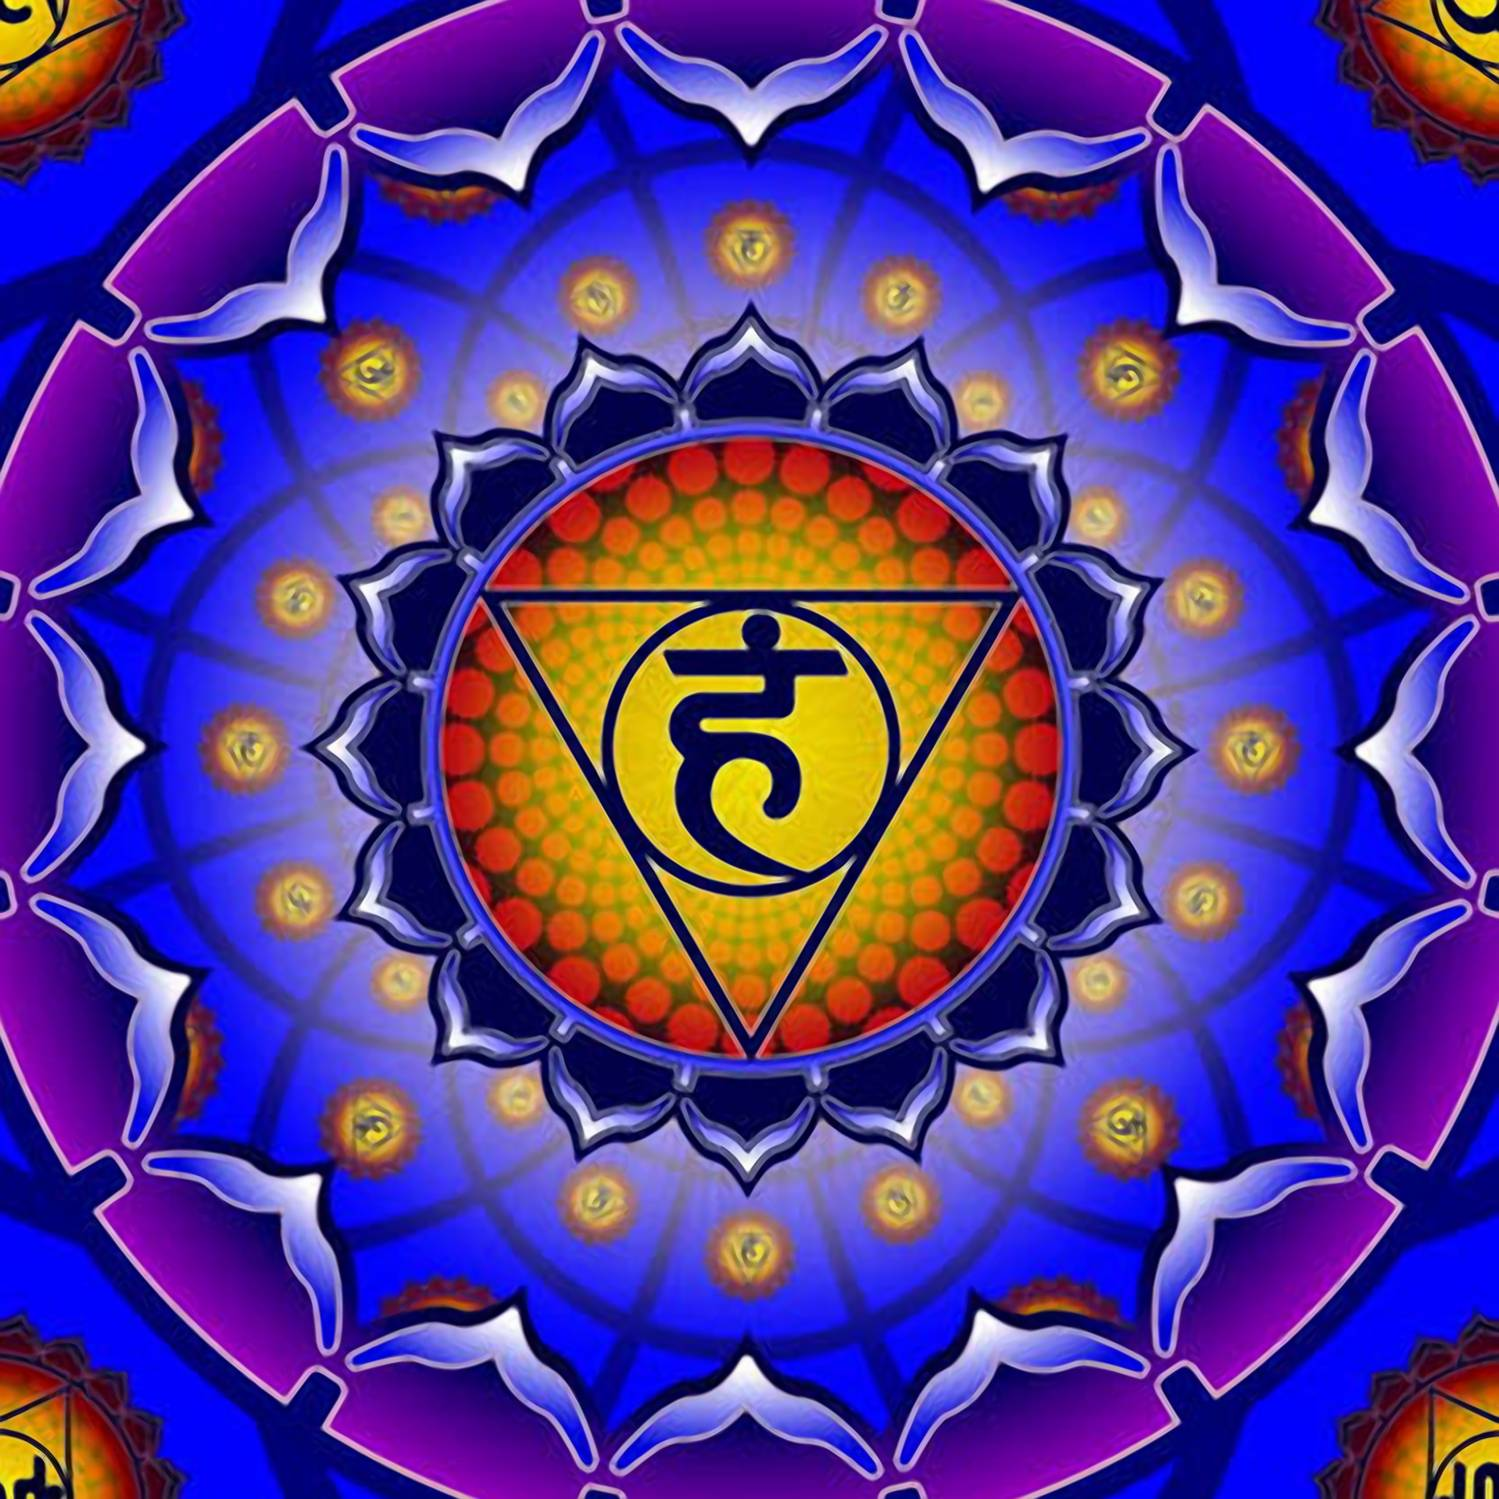 Пятая, горловая чакра — Вишудха